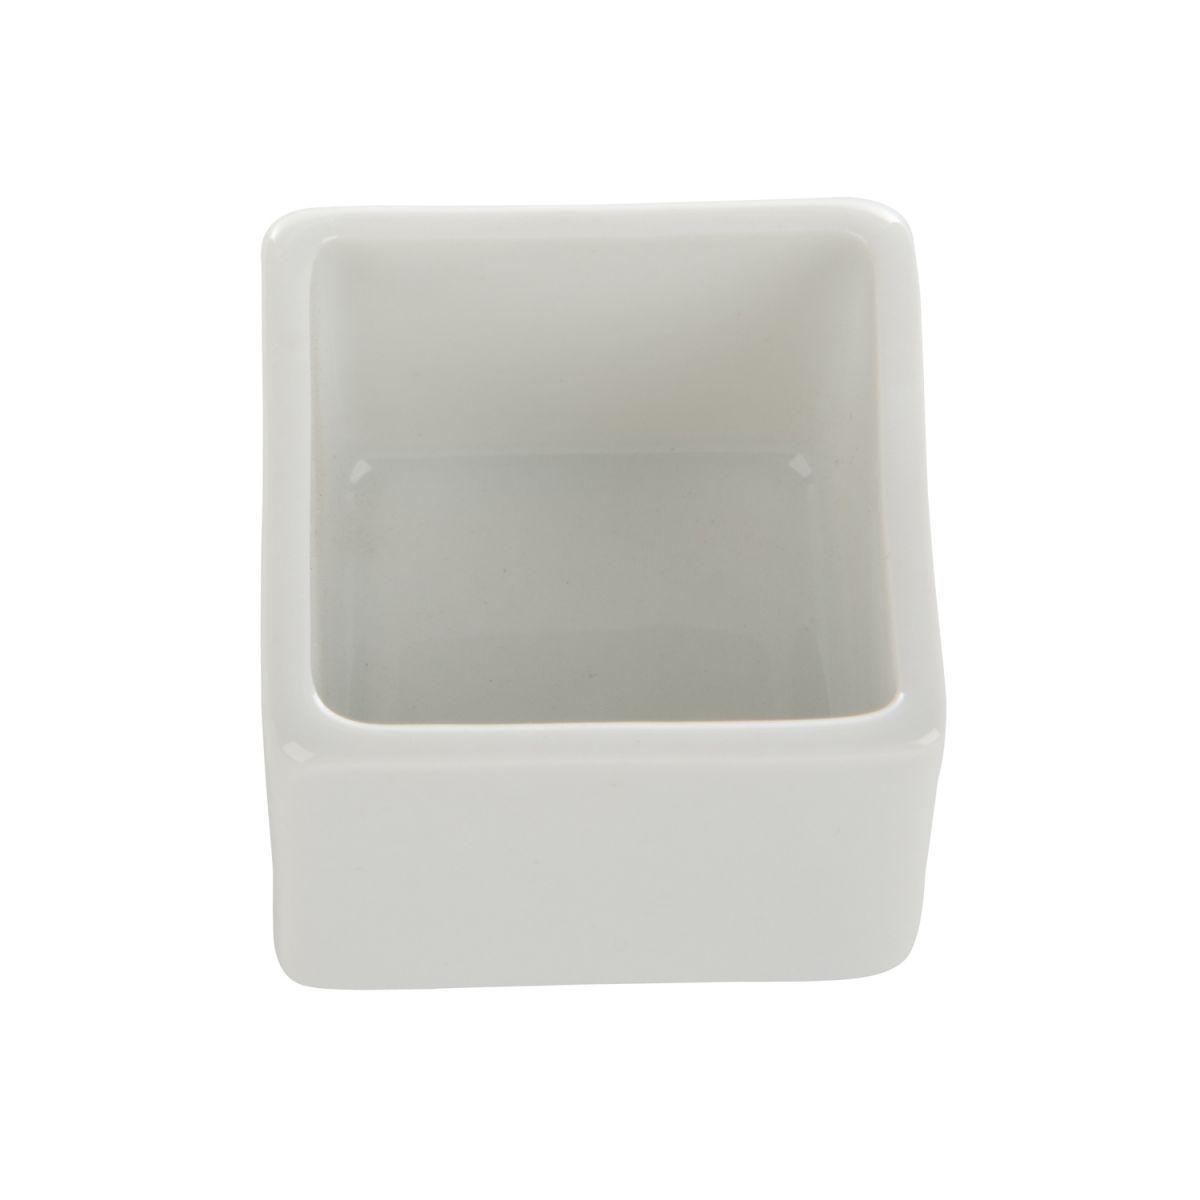 kommetje porselein vierkant wit 4x4x3cmbox 12